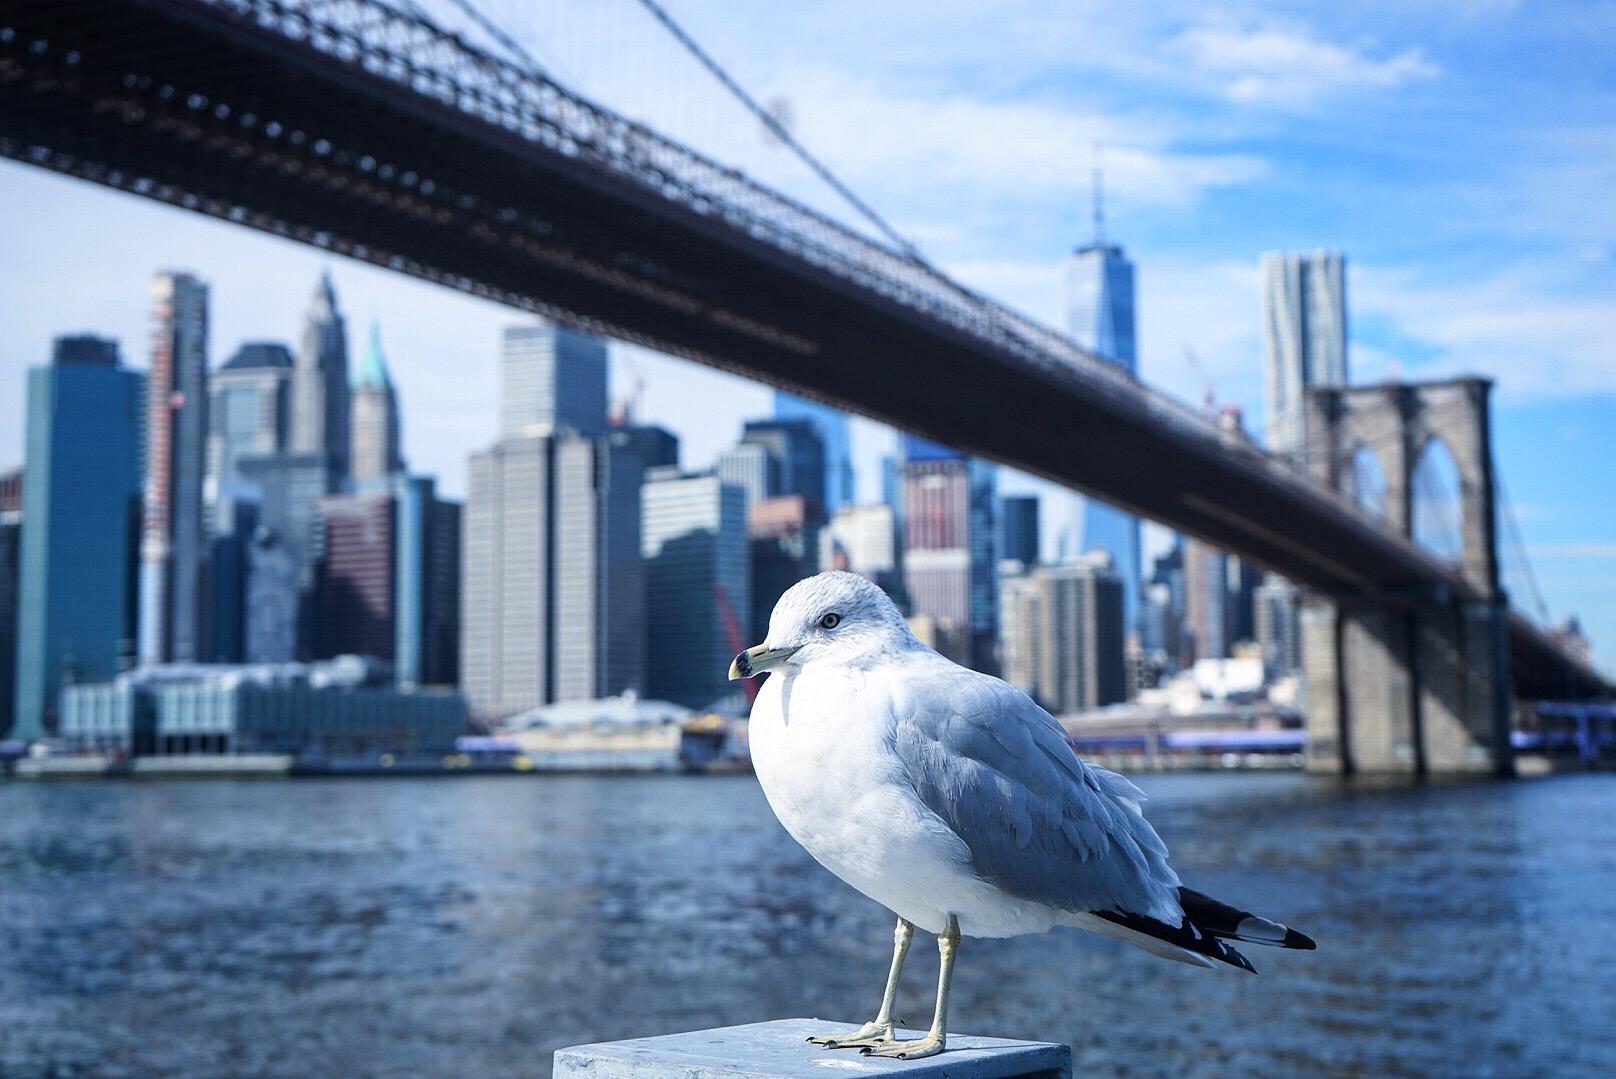 Skyline of New York City from the Brooklyn Bridge.